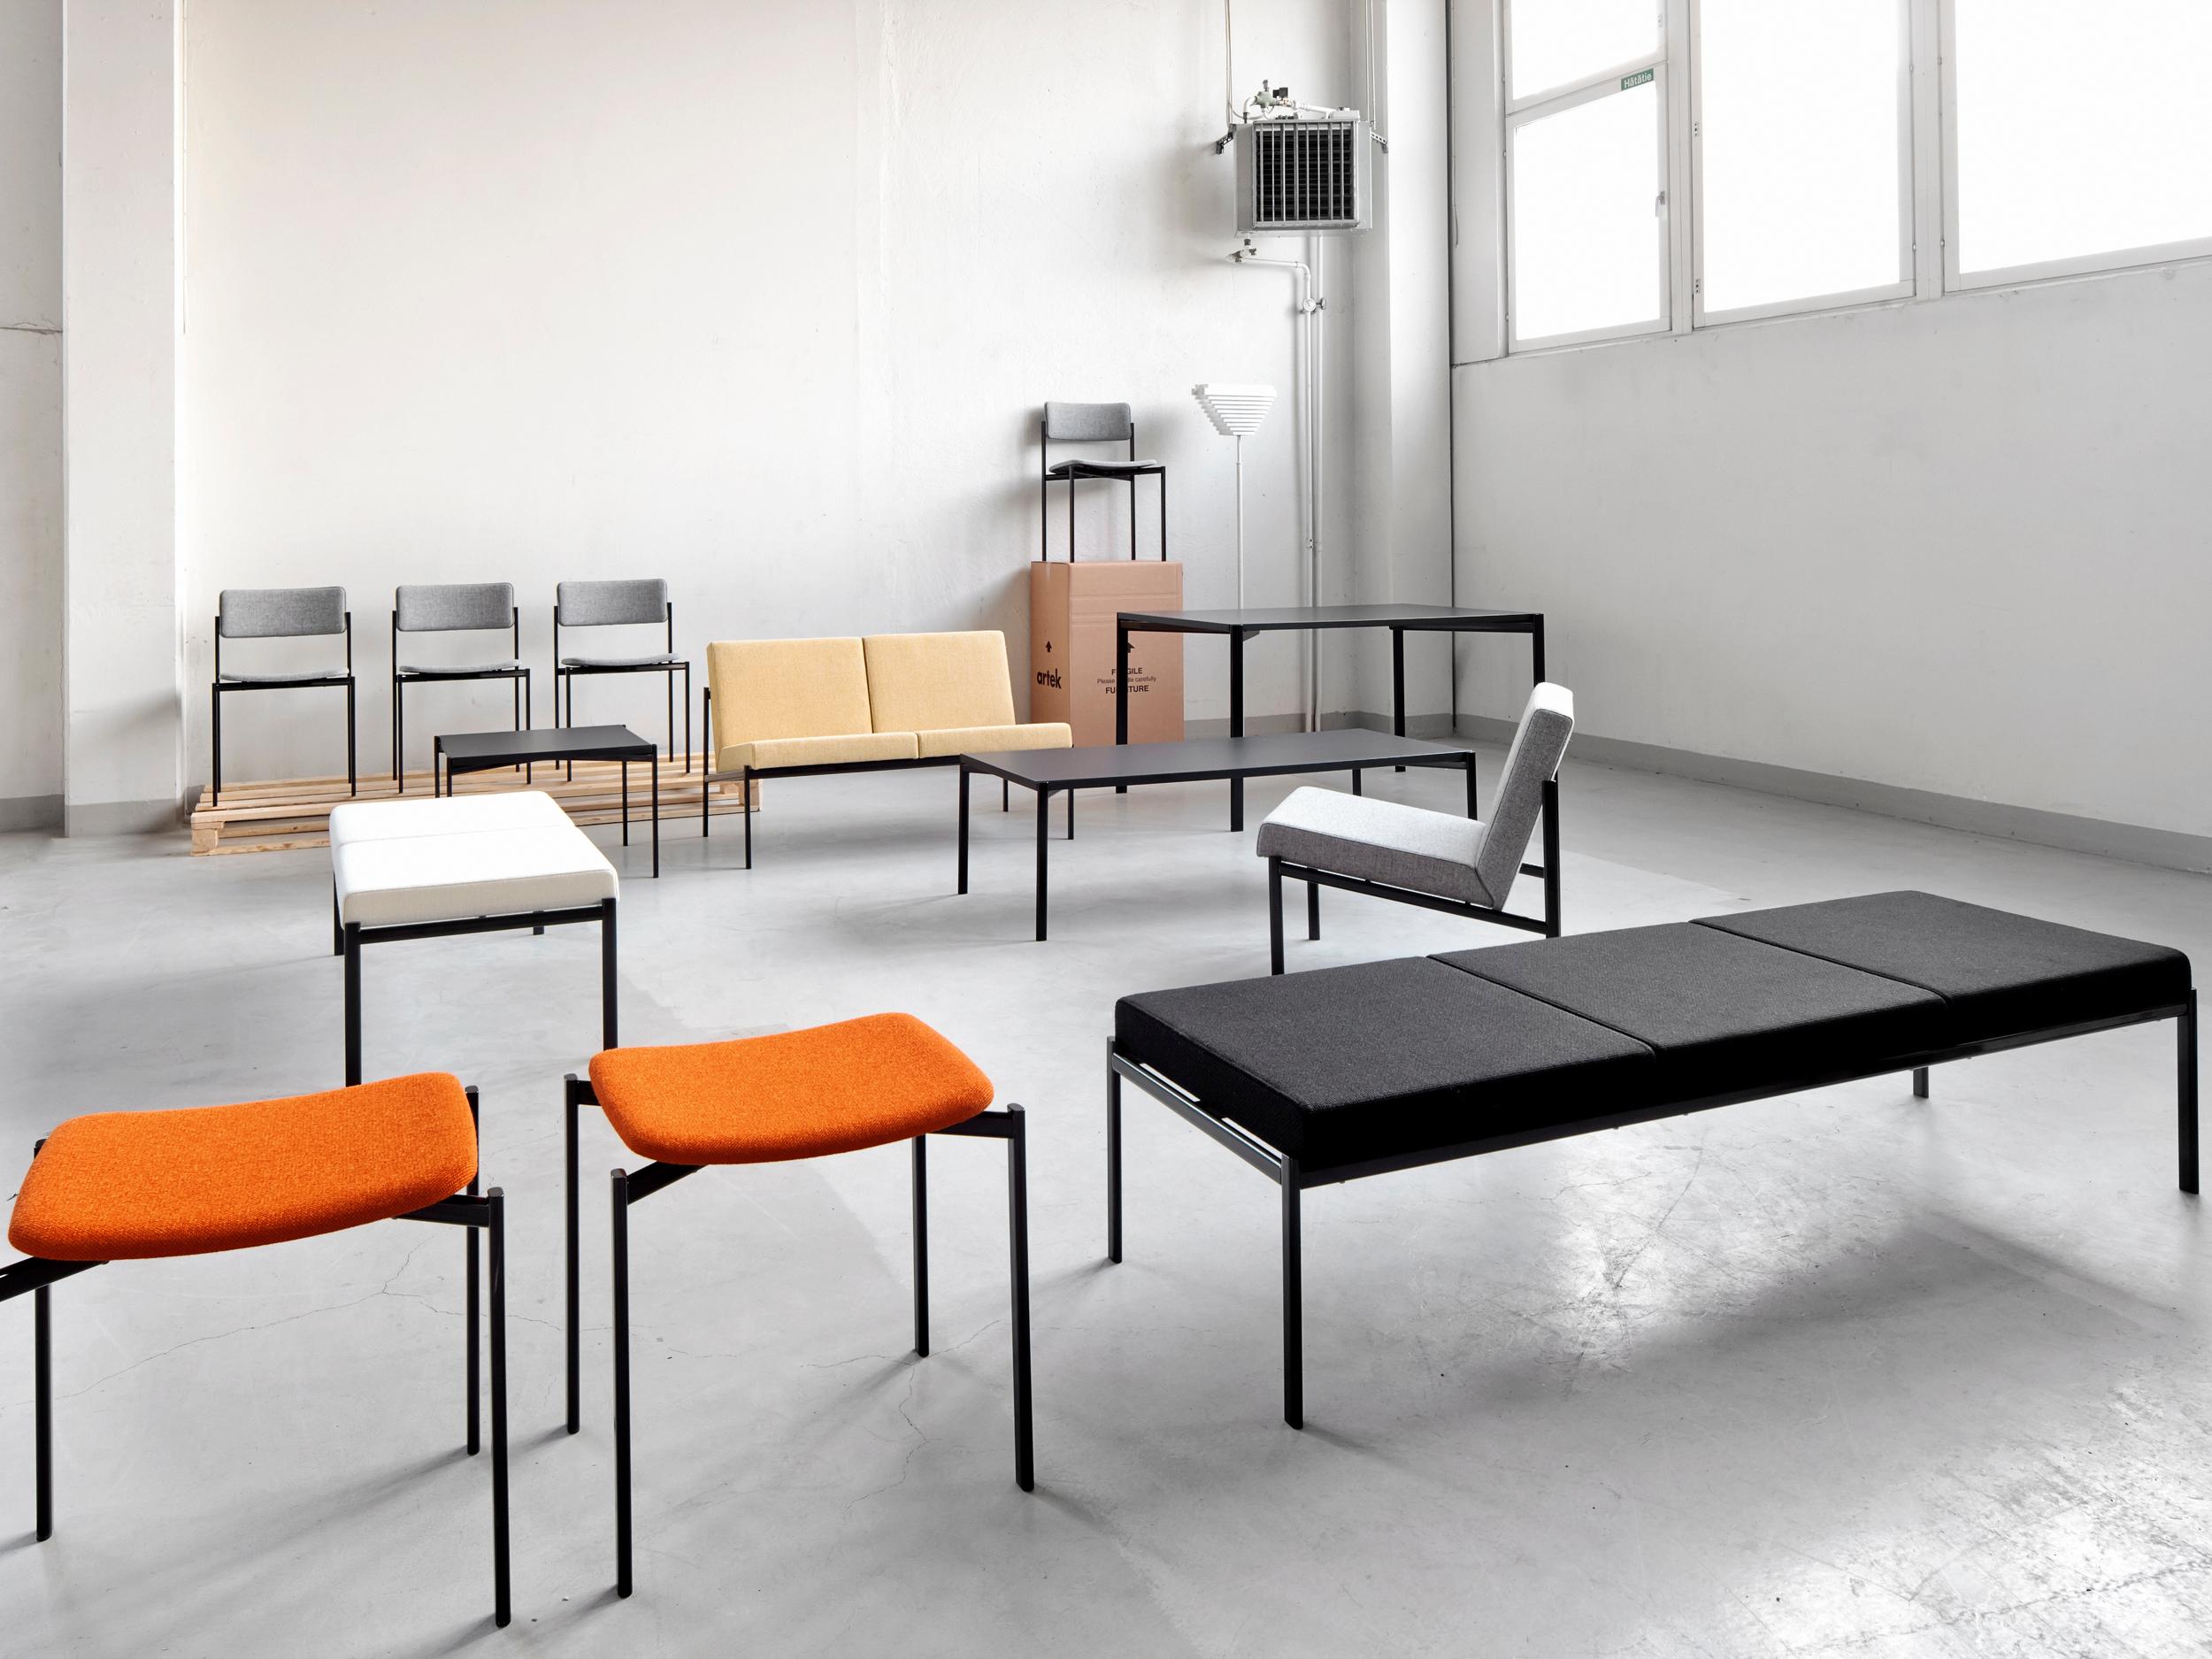 Kiki Bench and Sofa by Ilmari Tapiovaara for Artek